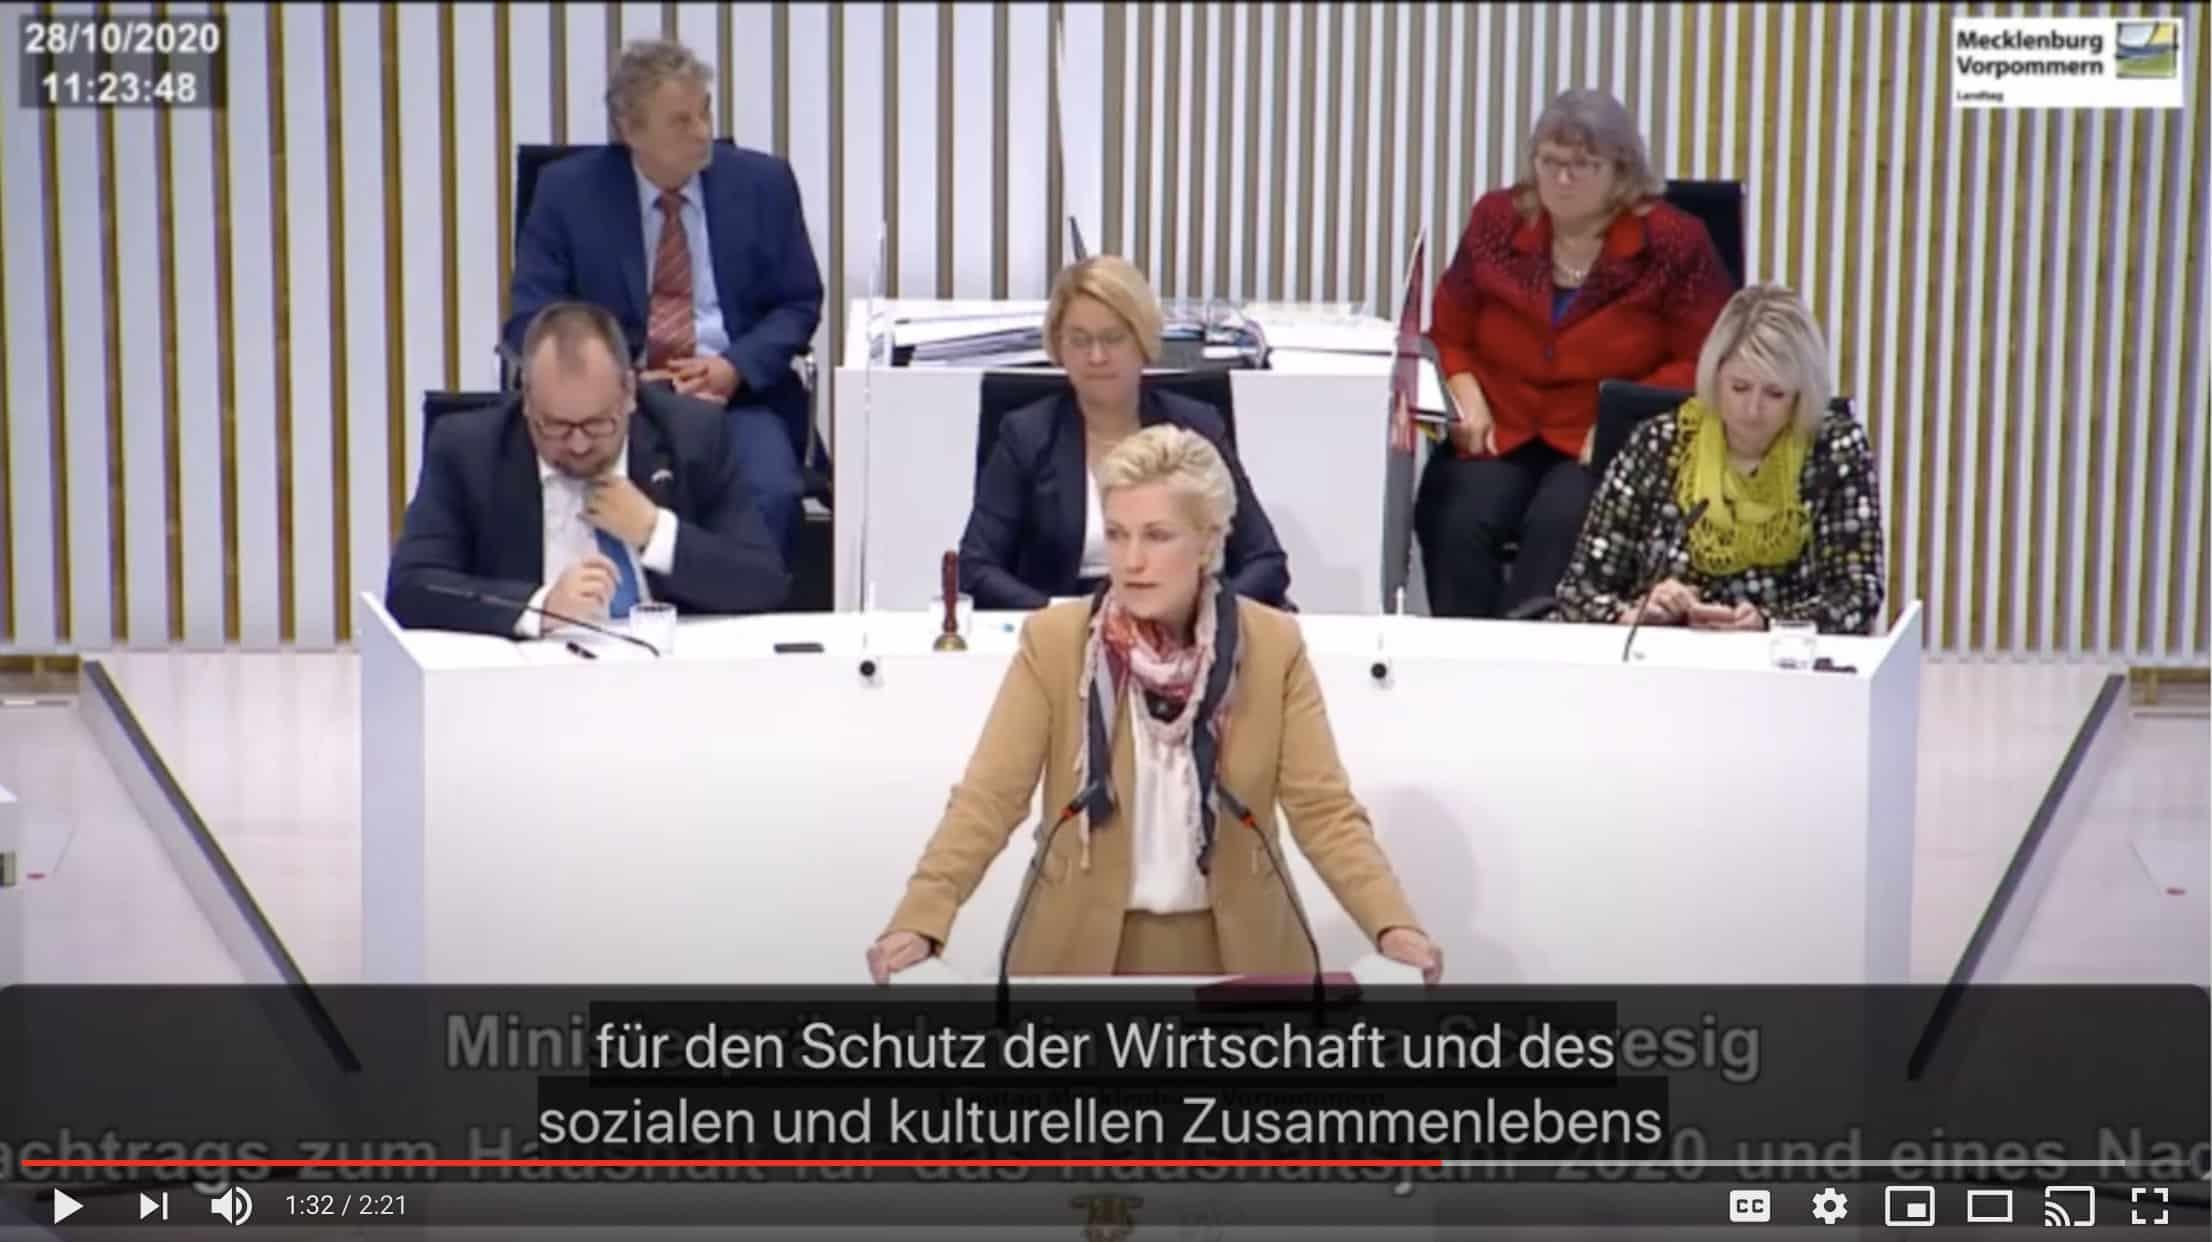 Ministerpraesidentin Manuela Schwesig in speaking in the state parliament of Mecklenburg-Western Pomerania